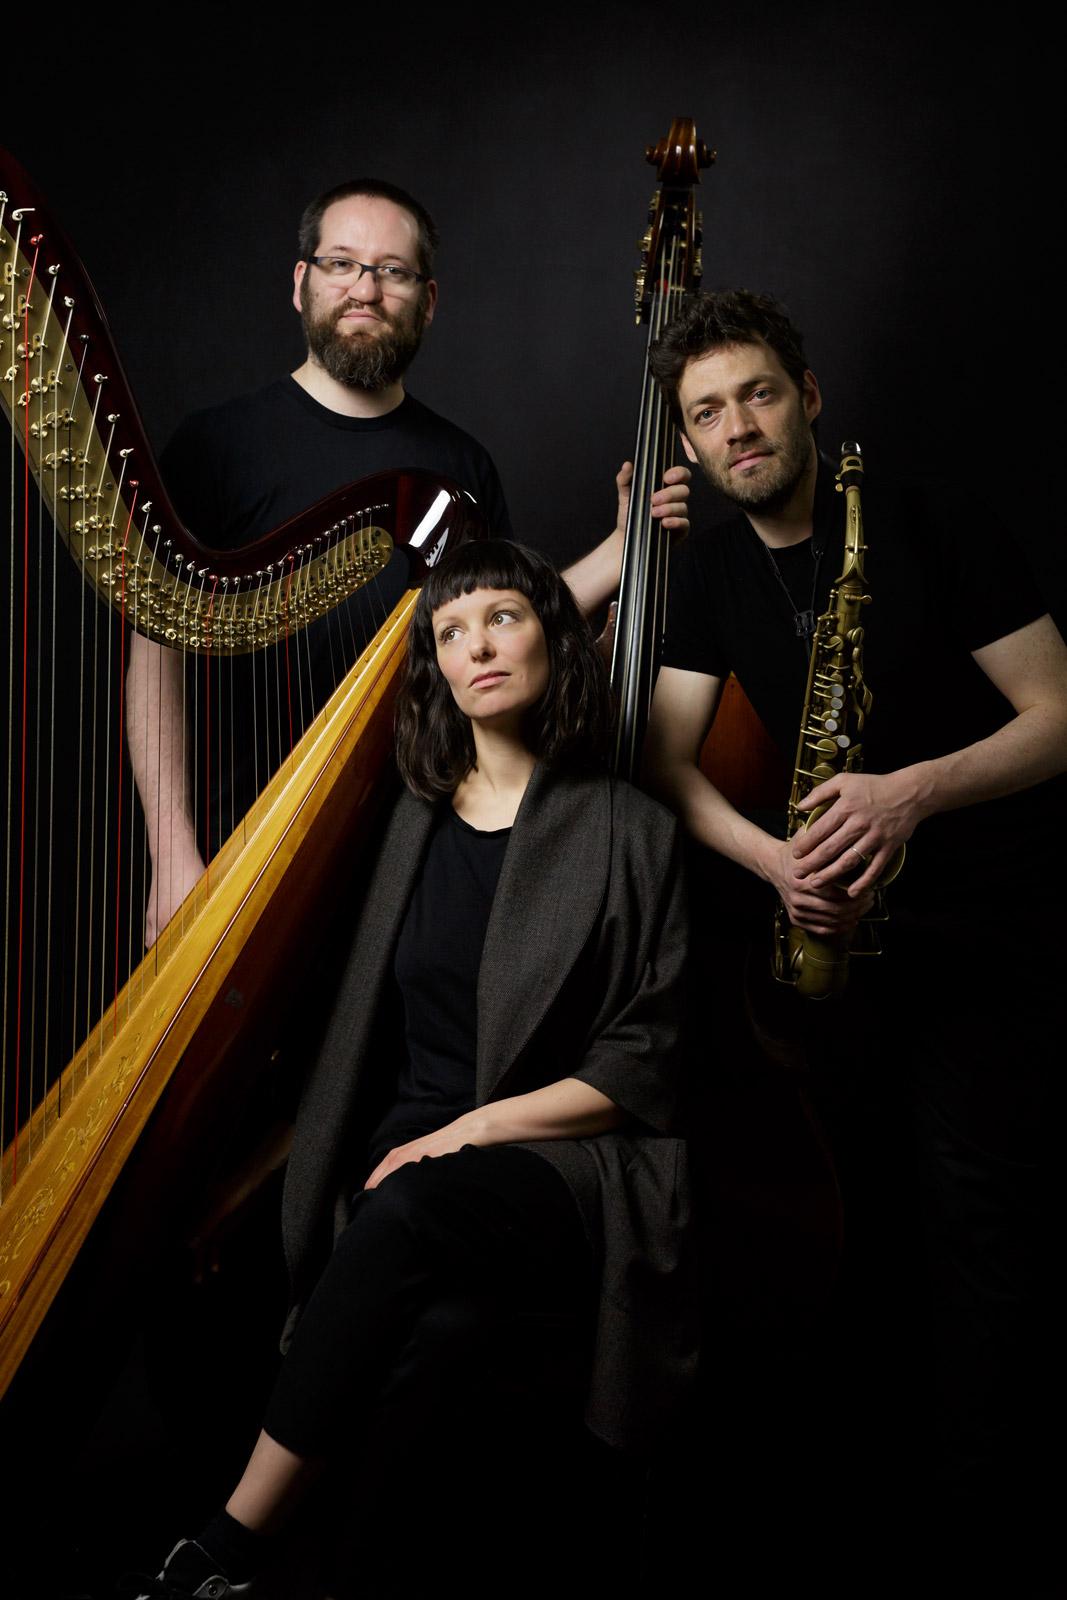 Kathrin Pechlof Trio | Salon21 Prien